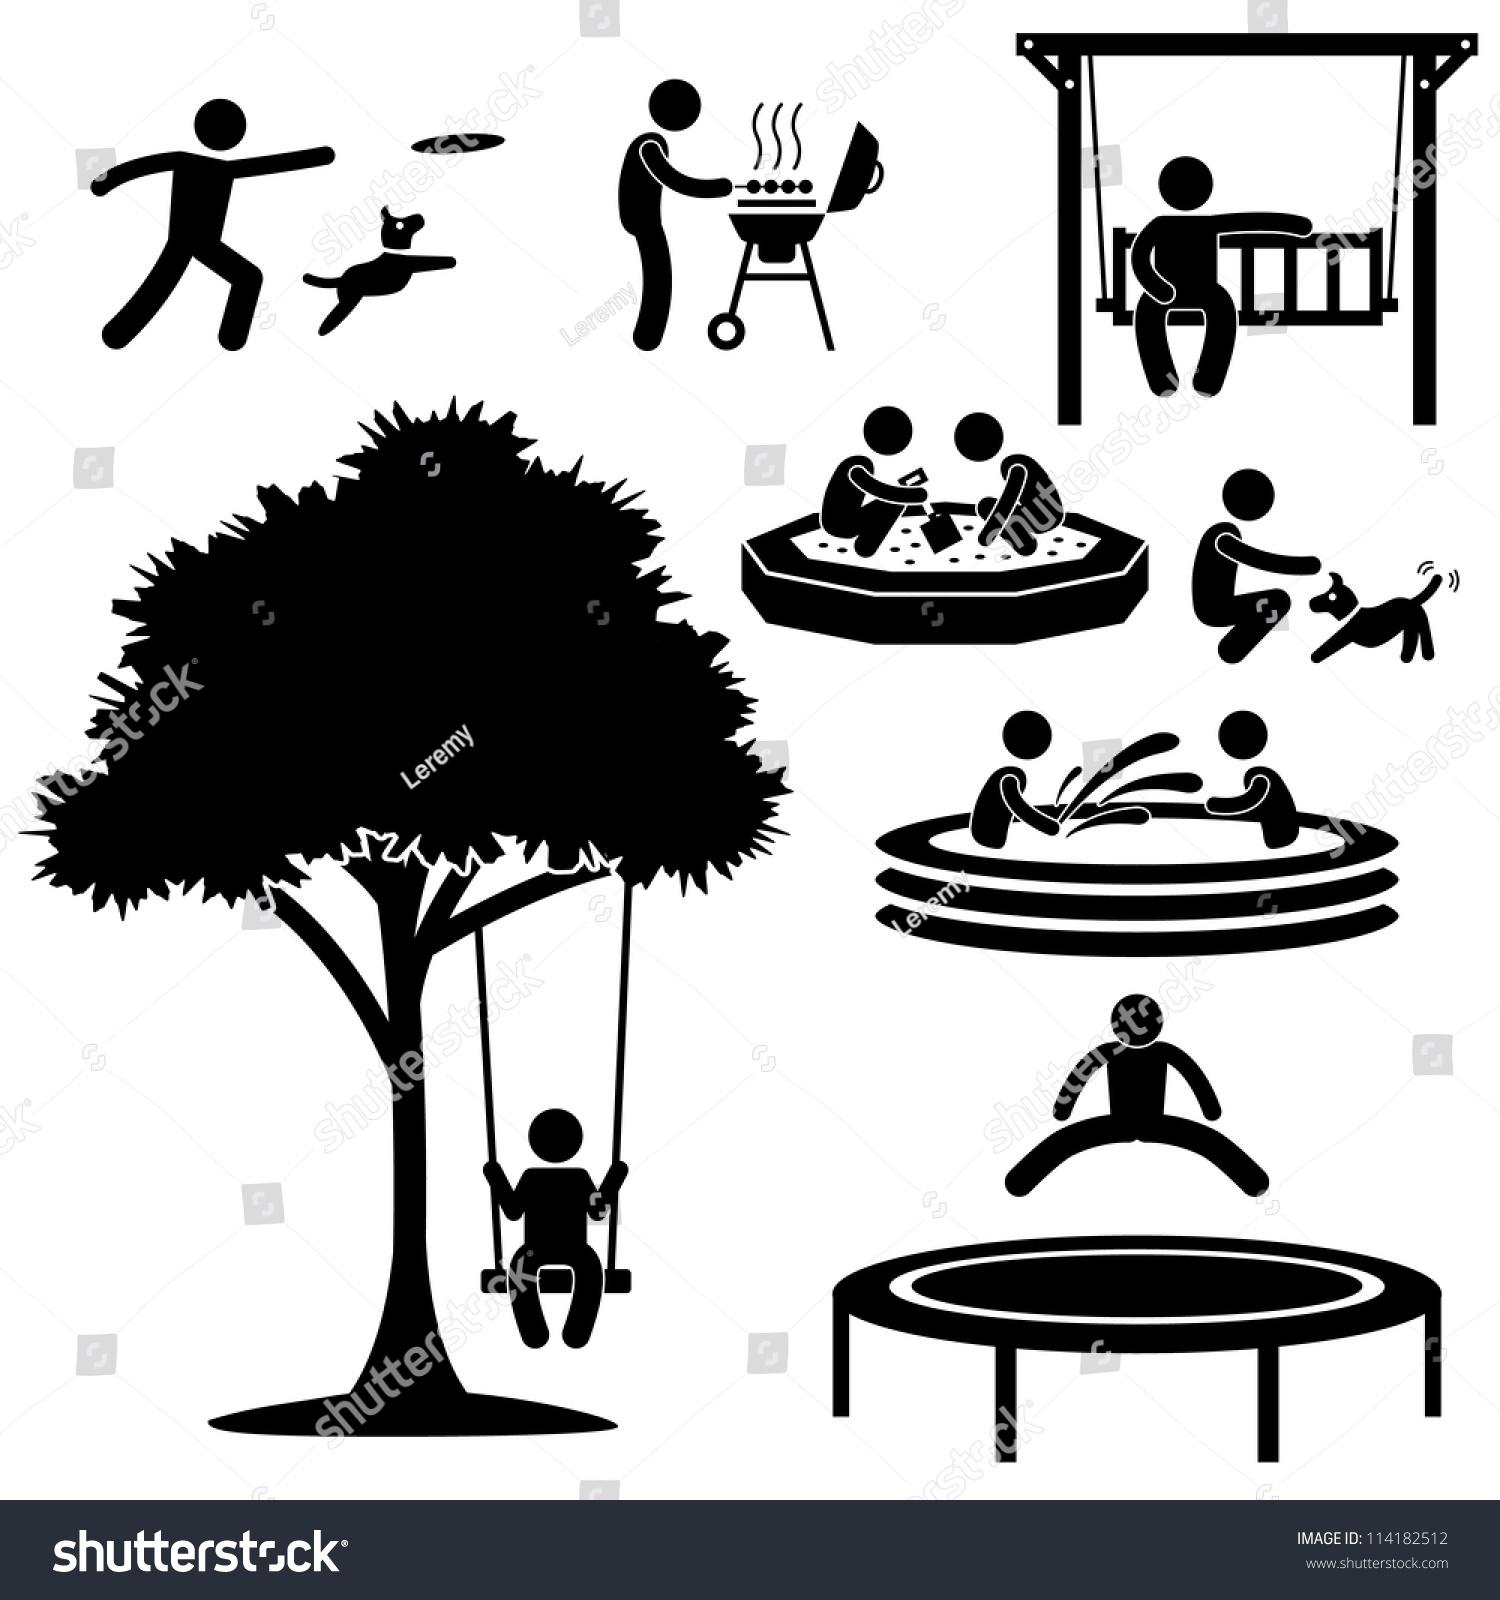 People Children Home Garden Park Playground Stock Vector